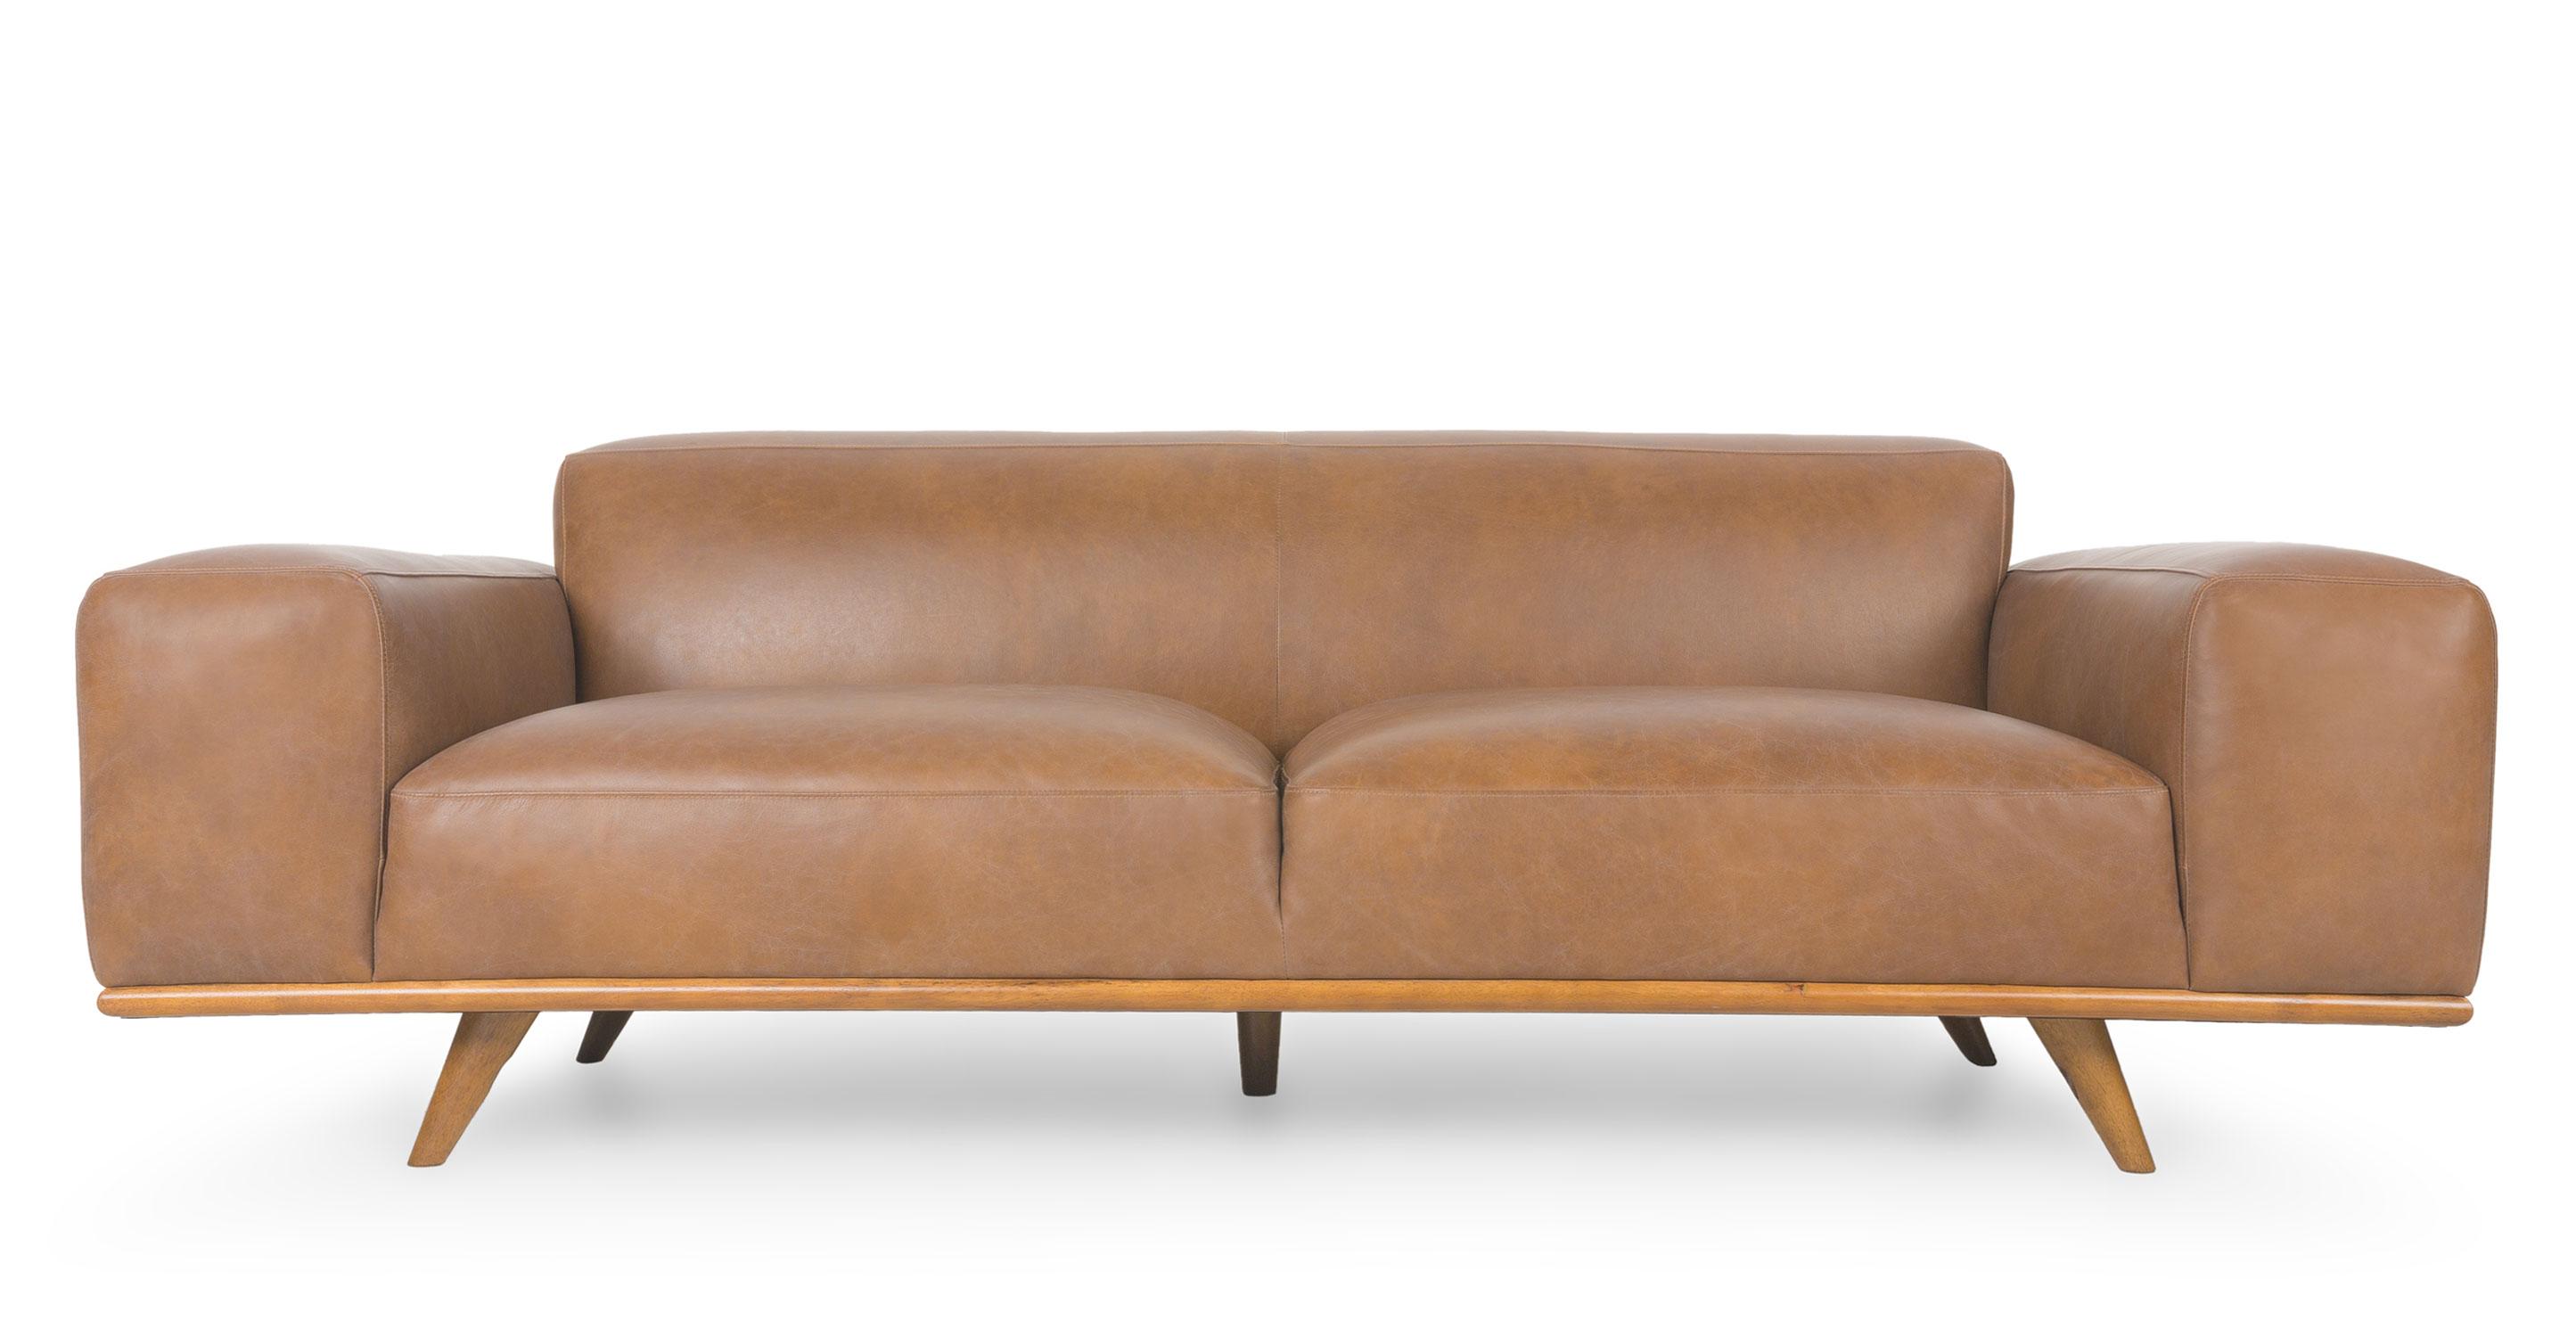 mid century style sofa canada modern sleeper comfortable snug oxford tan sofas and ottomans article